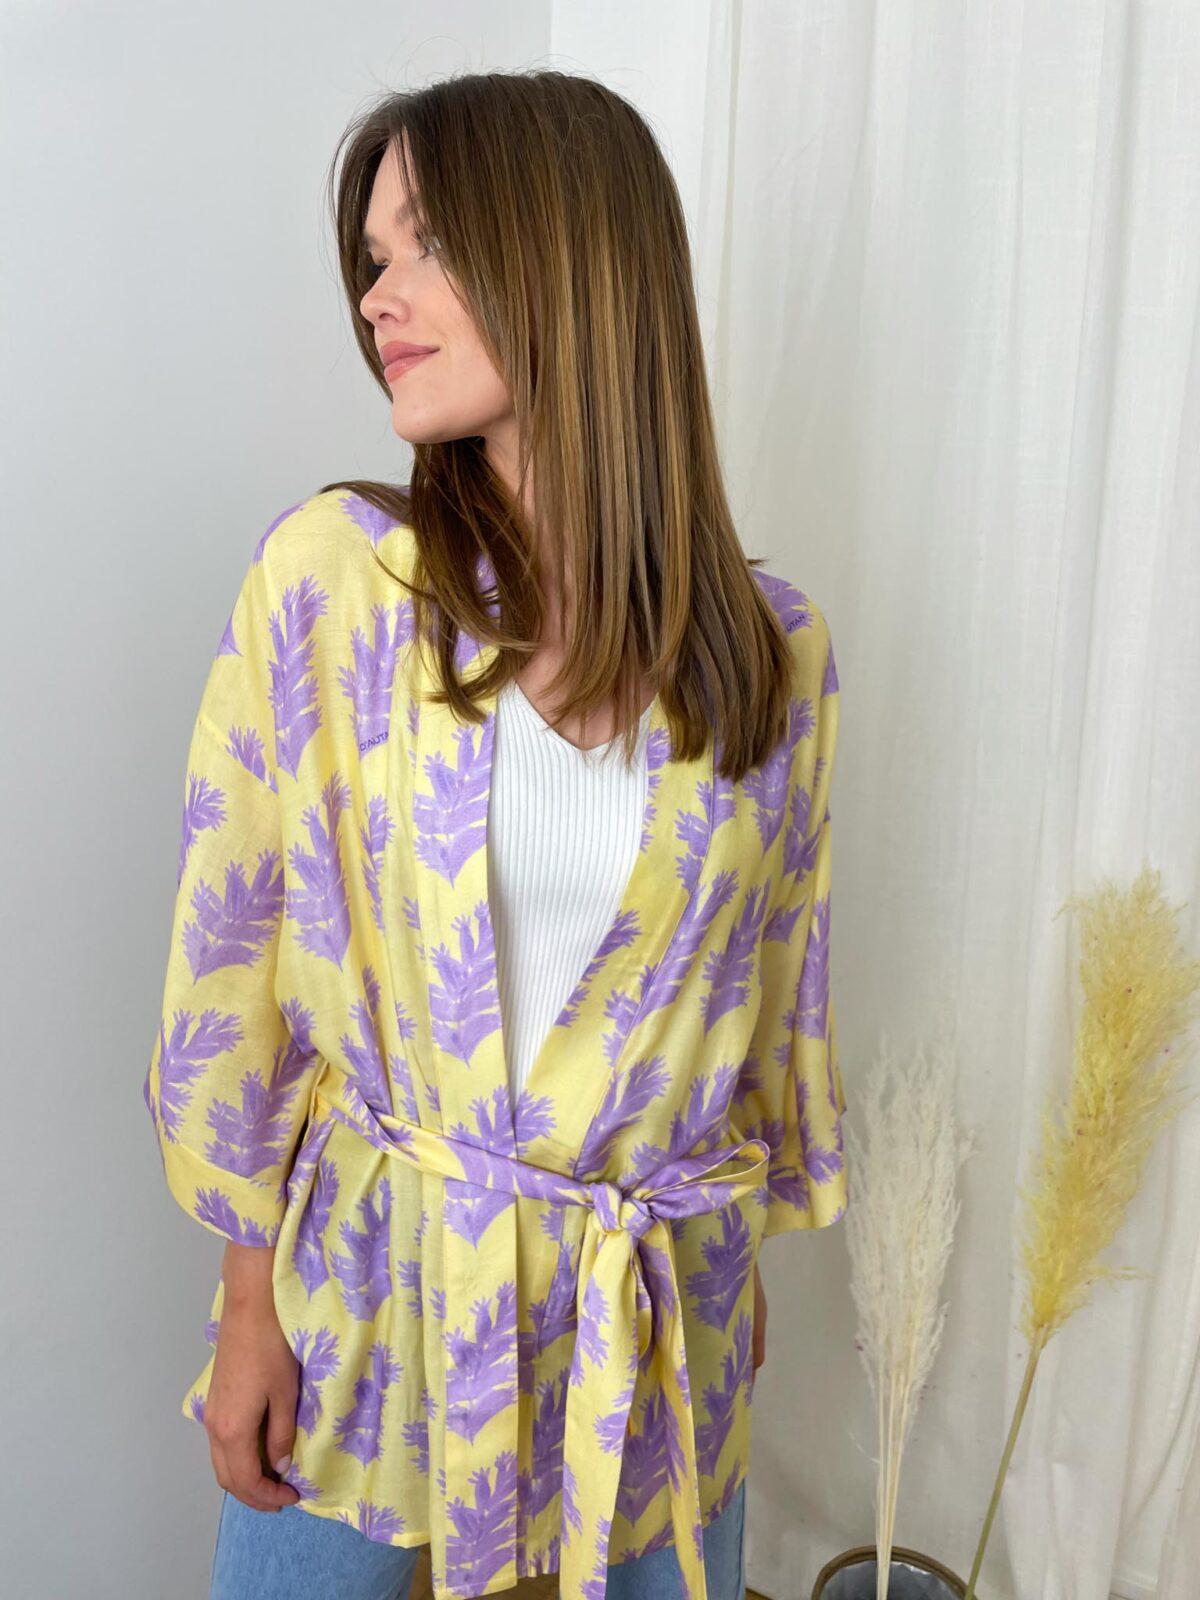 woman with a yellow kimono